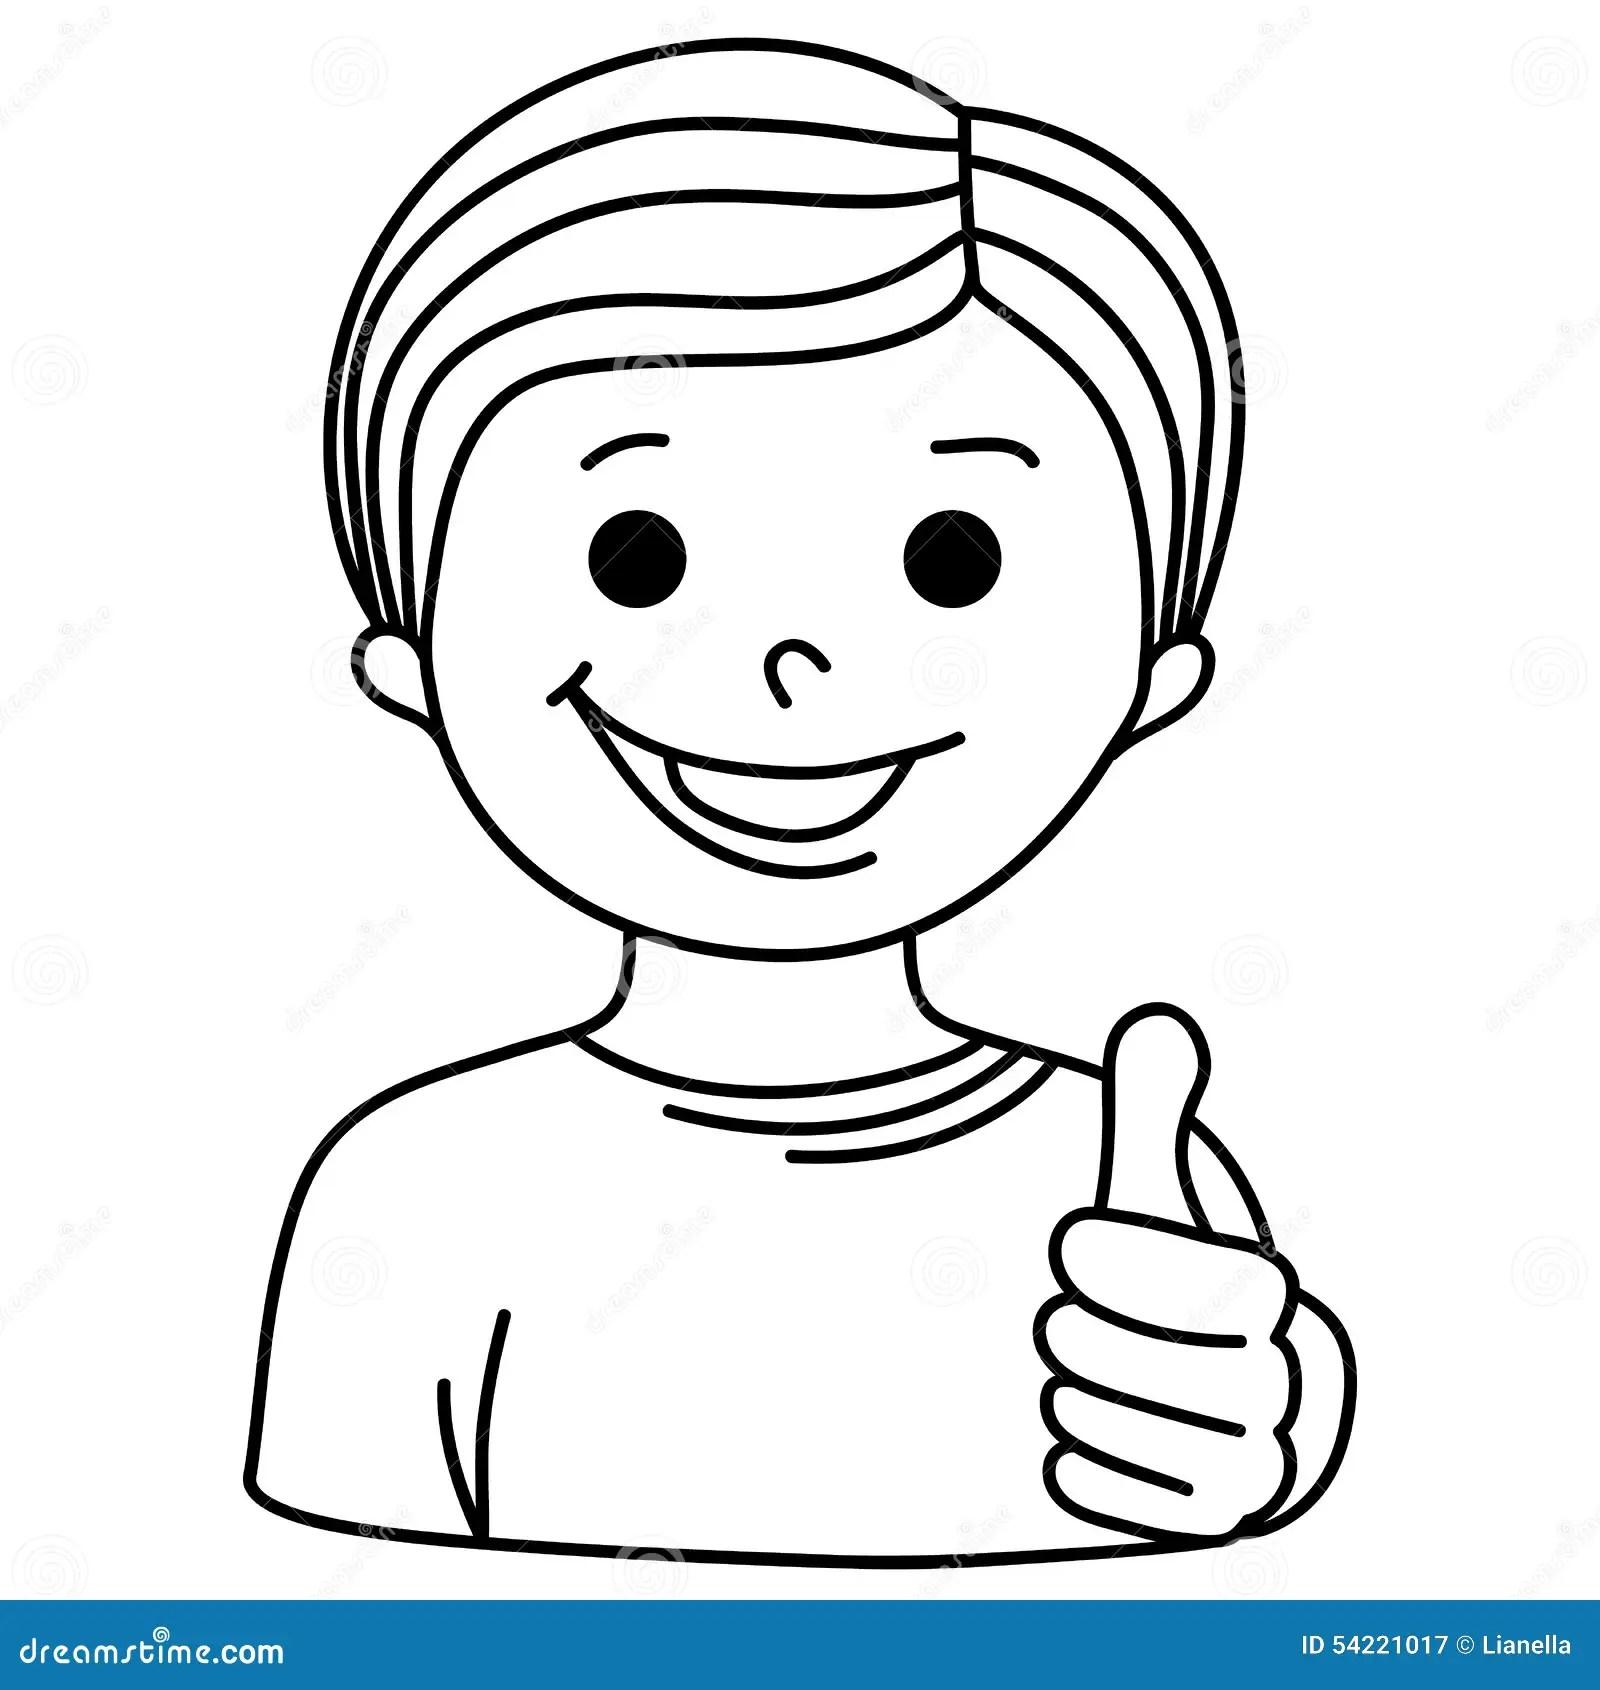 Cartoon Smiling Boy Showing Thumb Up Stock Vector